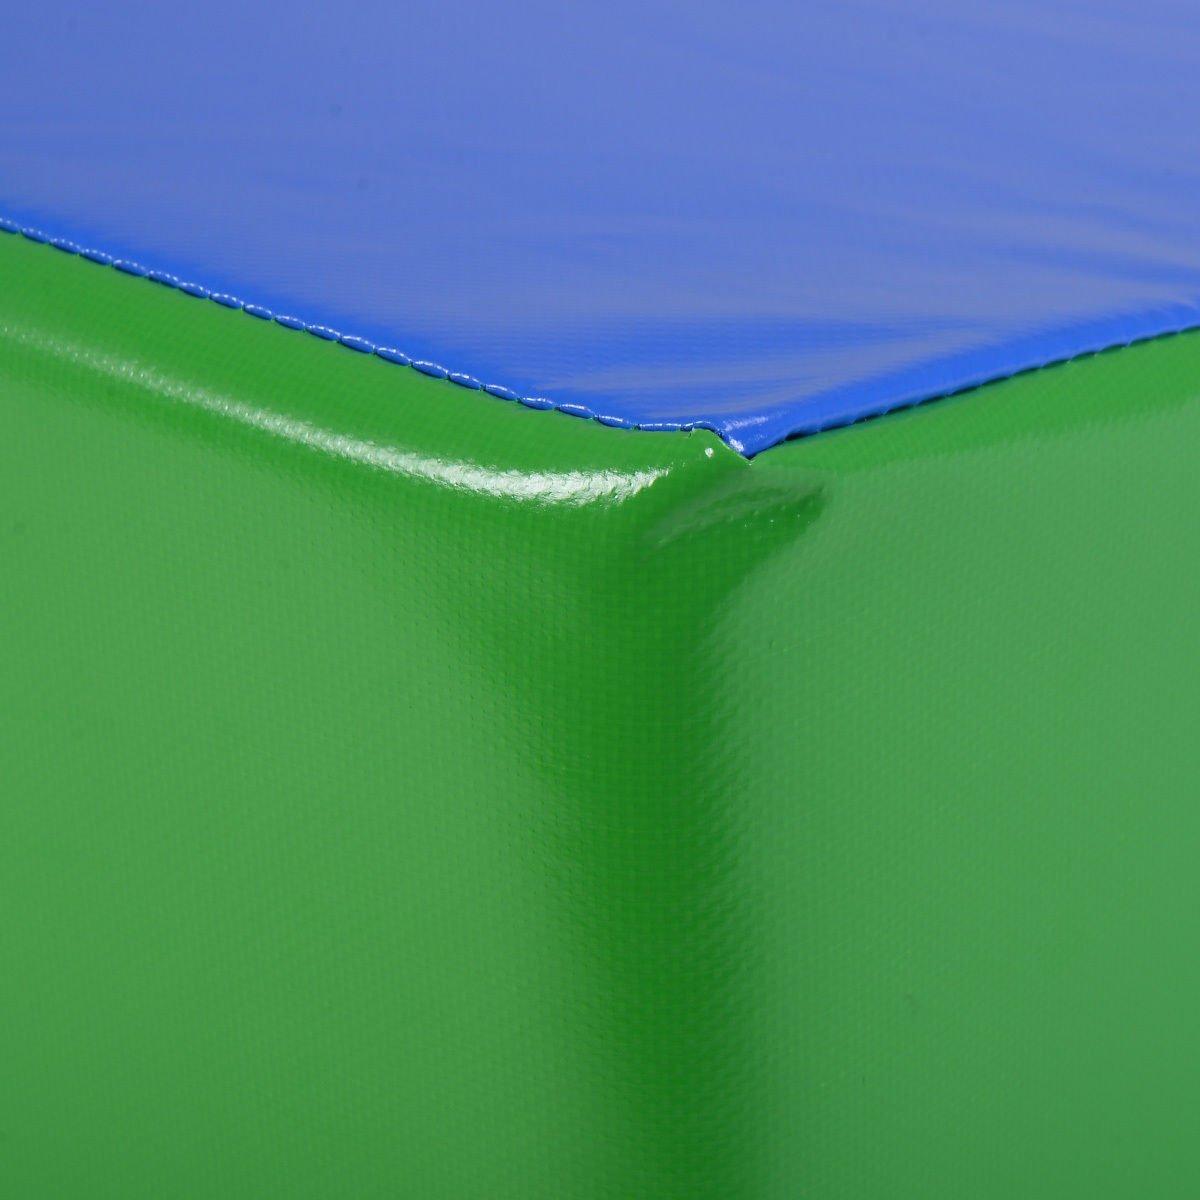 Incline Gymnastics Mat Wedge Folding Gymnastics Gym Fitness Tumbling 48''x24''x14'' by BUY JOY (Image #7)